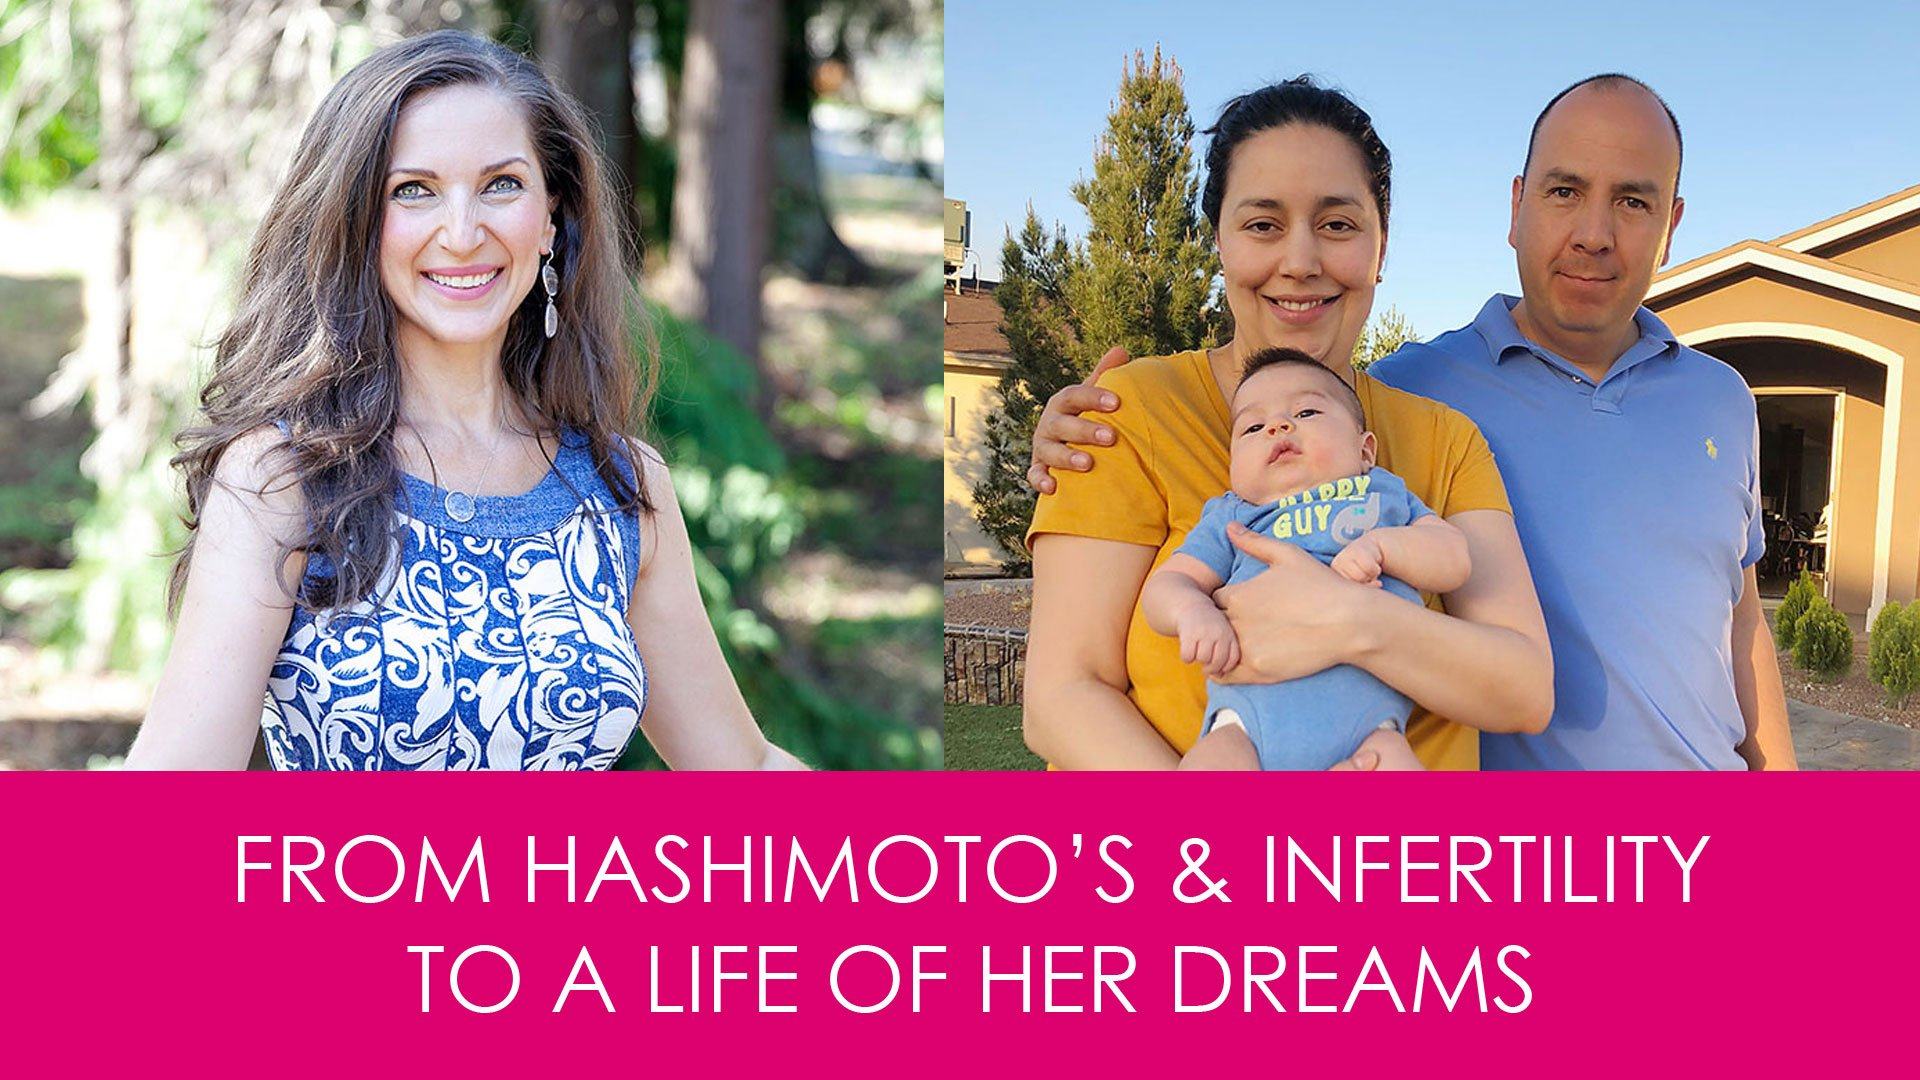 hashimoto's, infertility